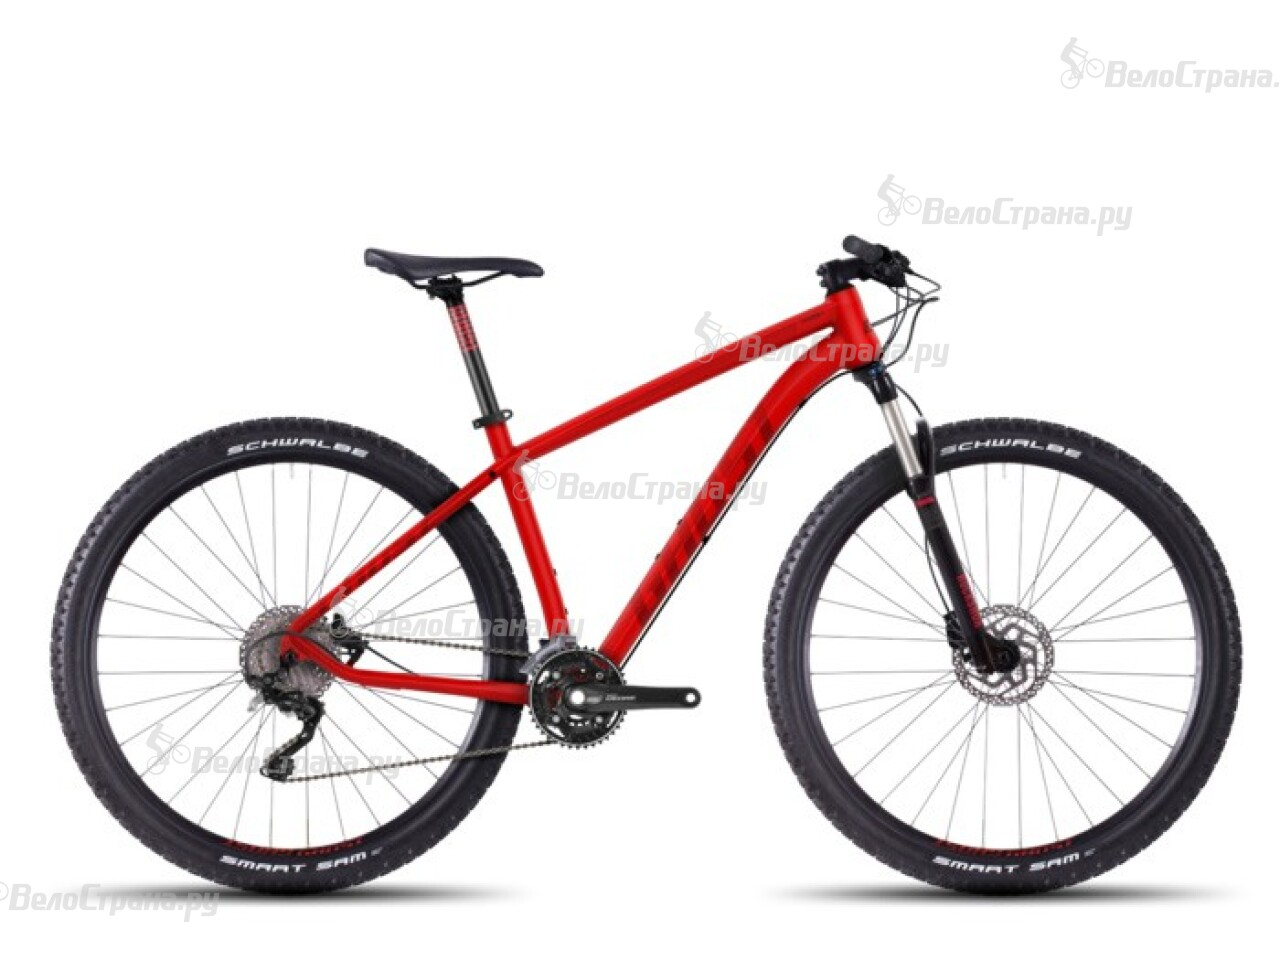 Велосипед Ghost Tacana 7 (2016) цены онлайн